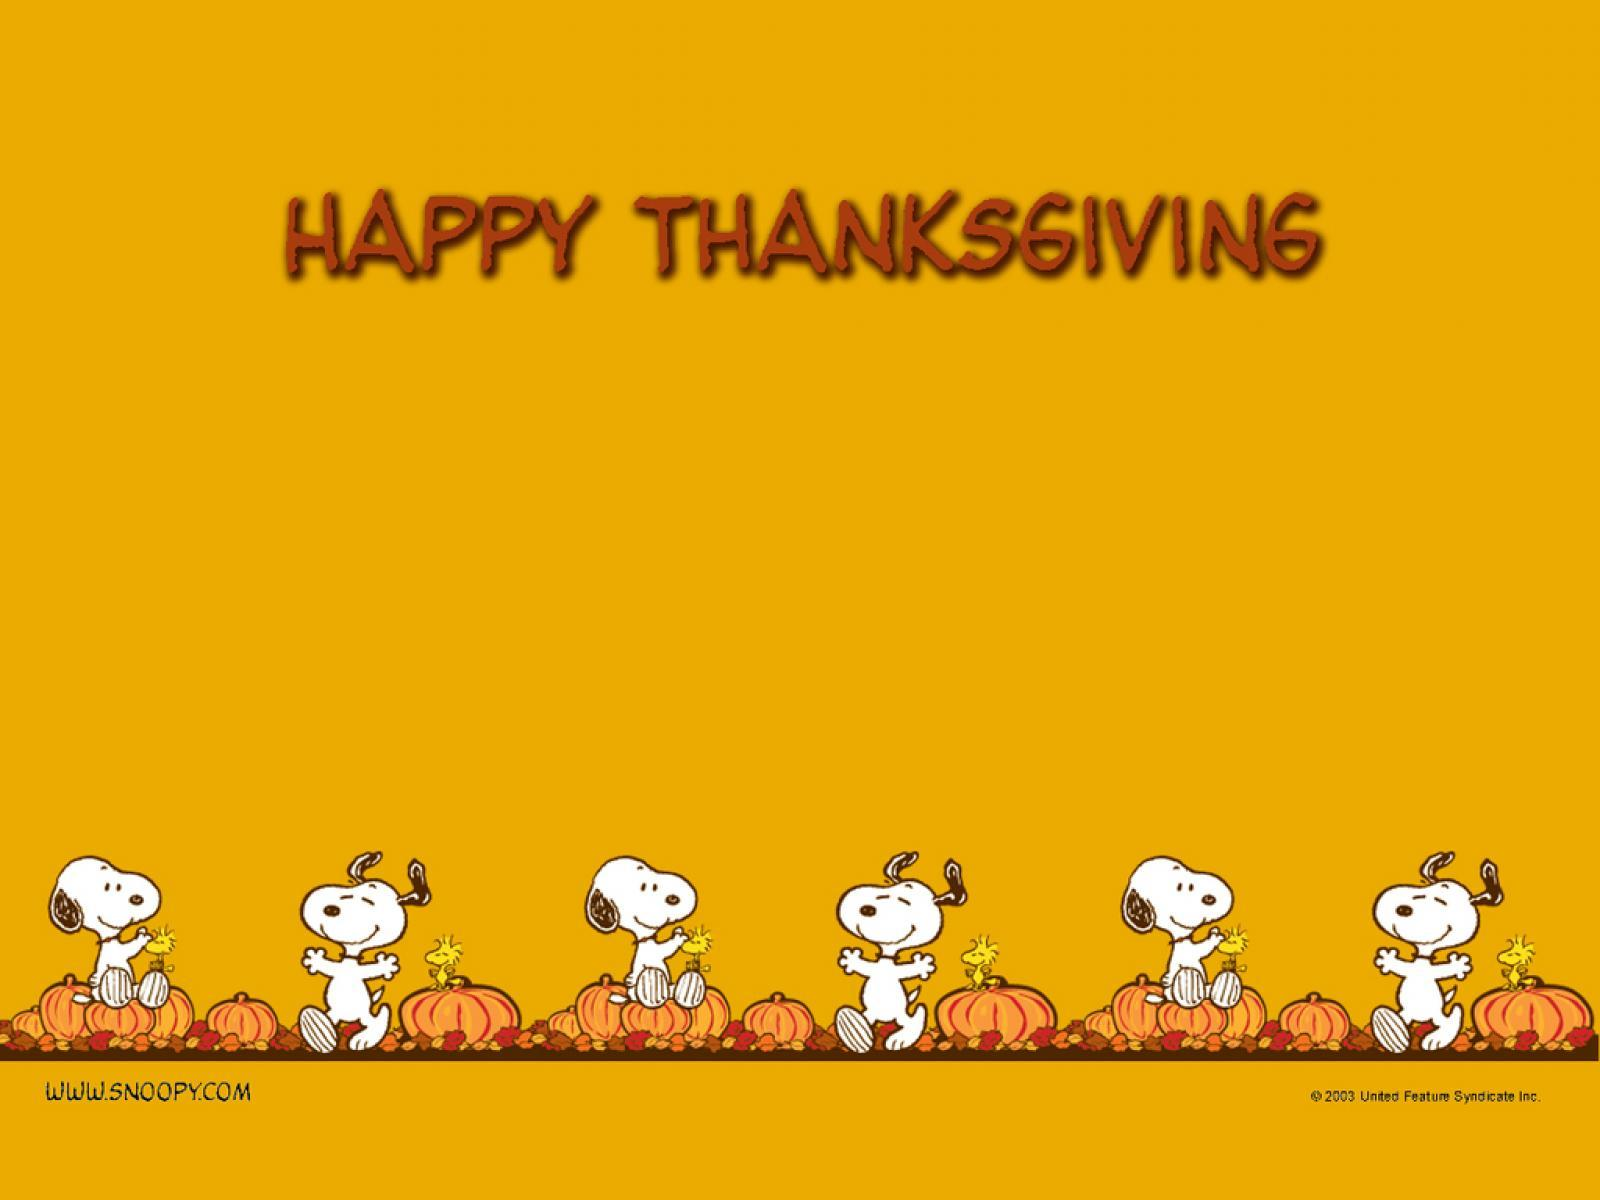 Wallpapers For > Funny Thanksgiving Wallpaper Desktop